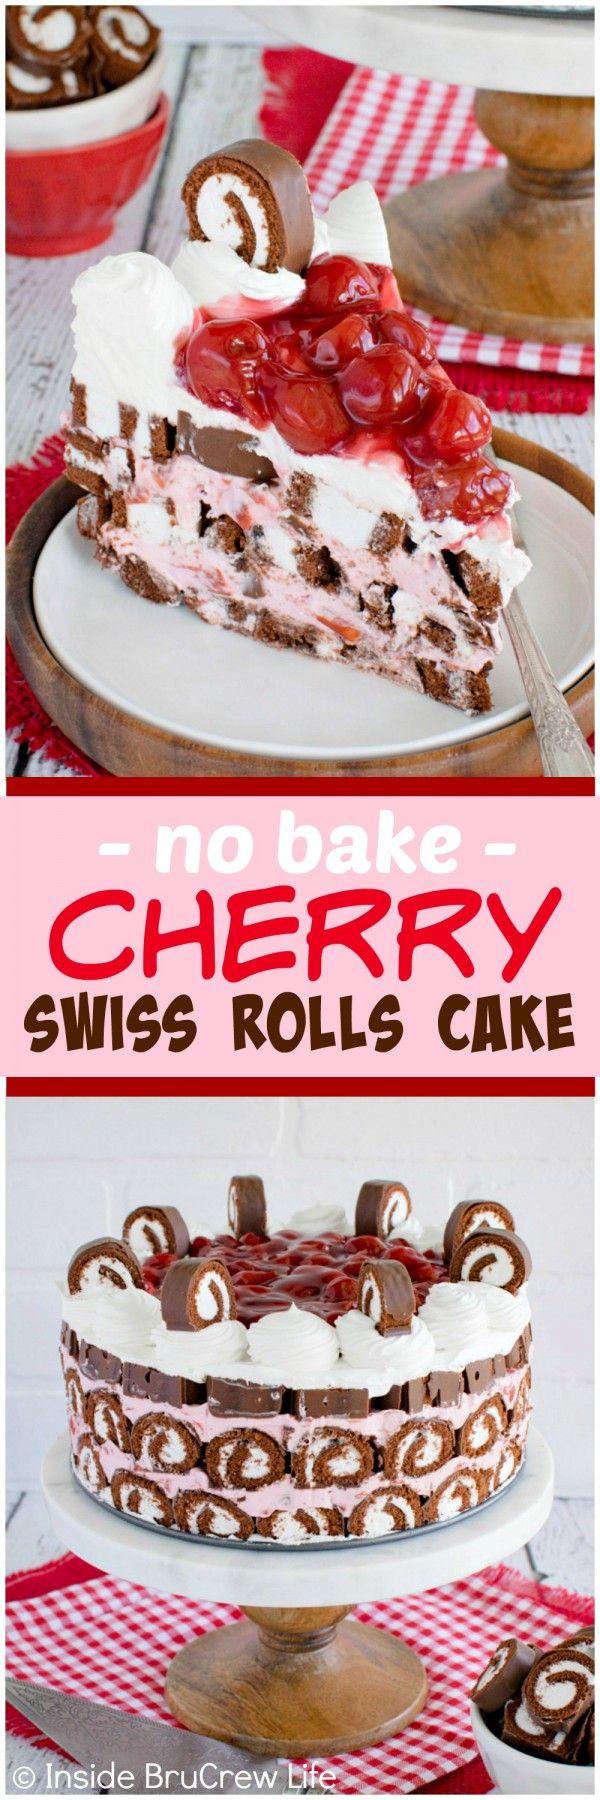 No Bake Cherry Swiss Rolls Cake - layers of cherry cheesecake and chocolate snack cakes makes this cake amazing! Great dessert recipe! #ad